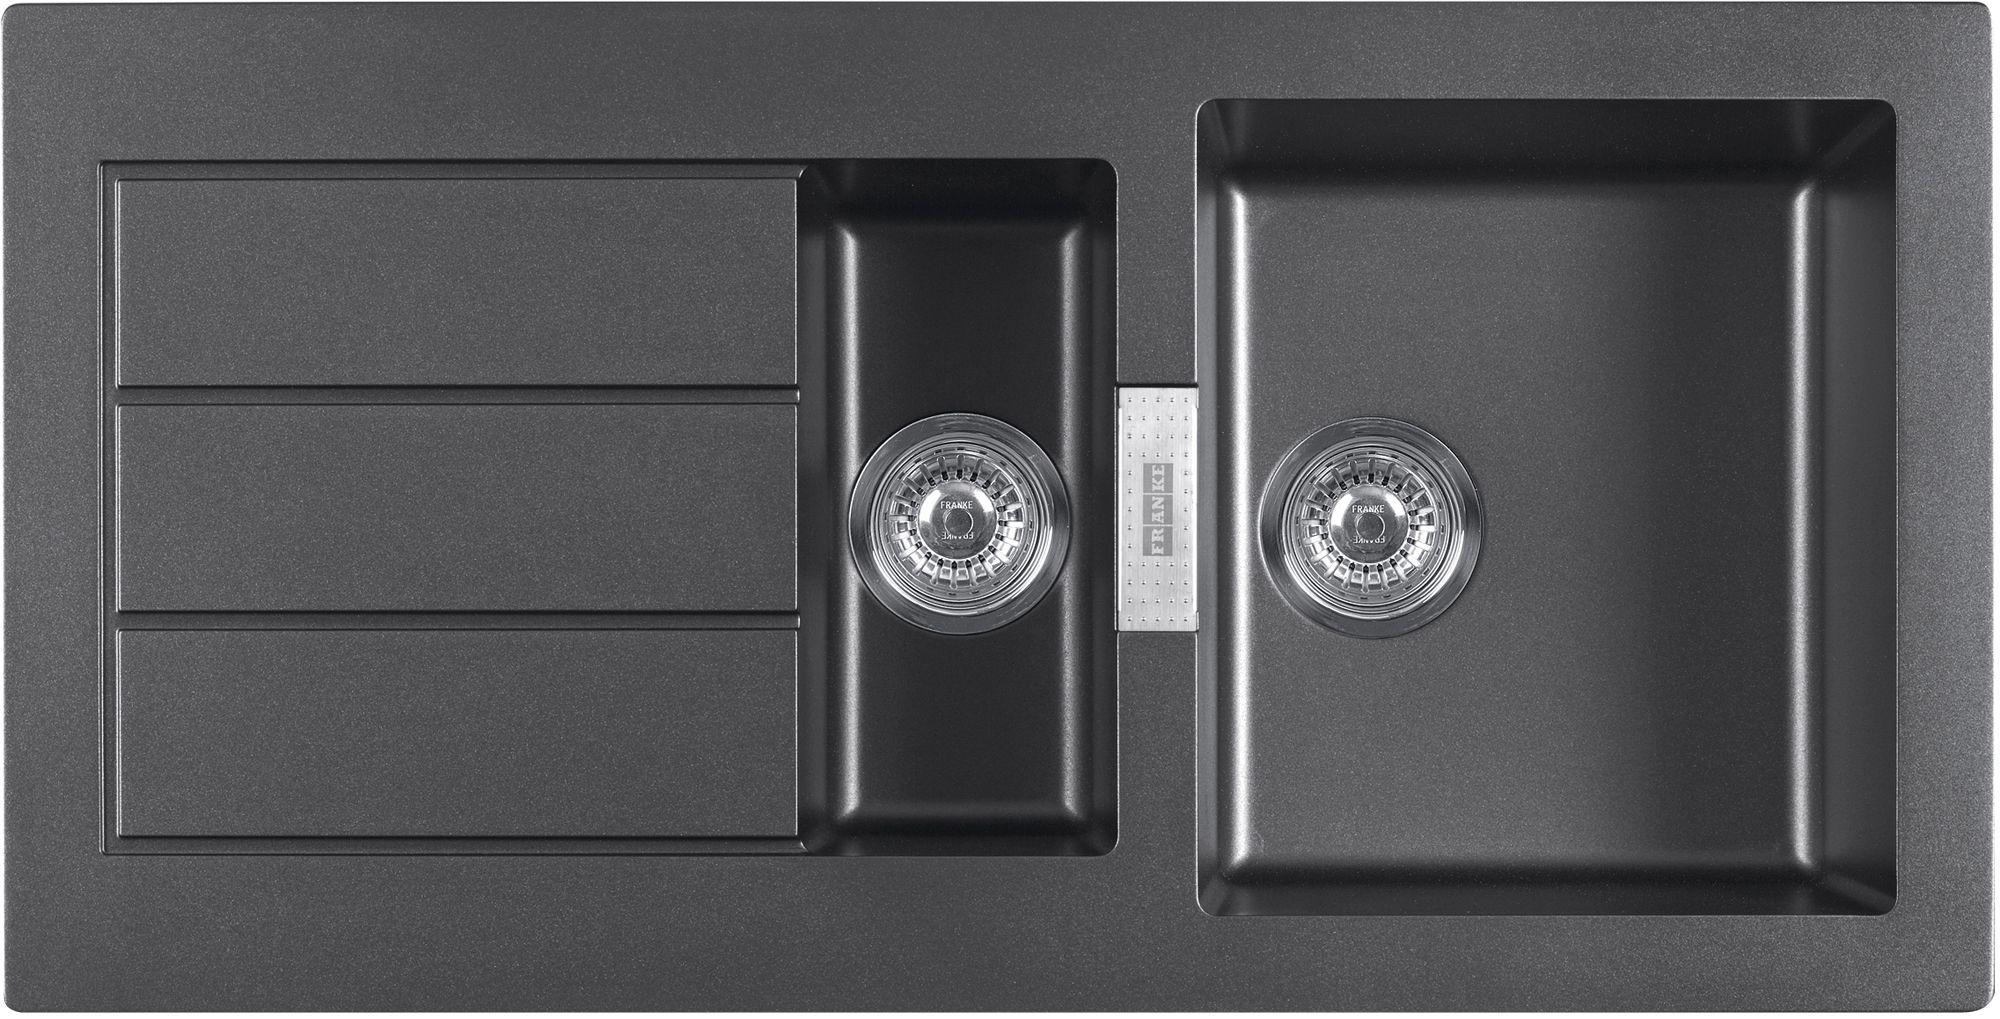 1.5 Bowl Kitchen Sink Franke sirius 15 bowl black composite 15 kitchen sink franke sirius 15 bowl black composite 15 kitchen sink departments diy at bq workwithnaturefo